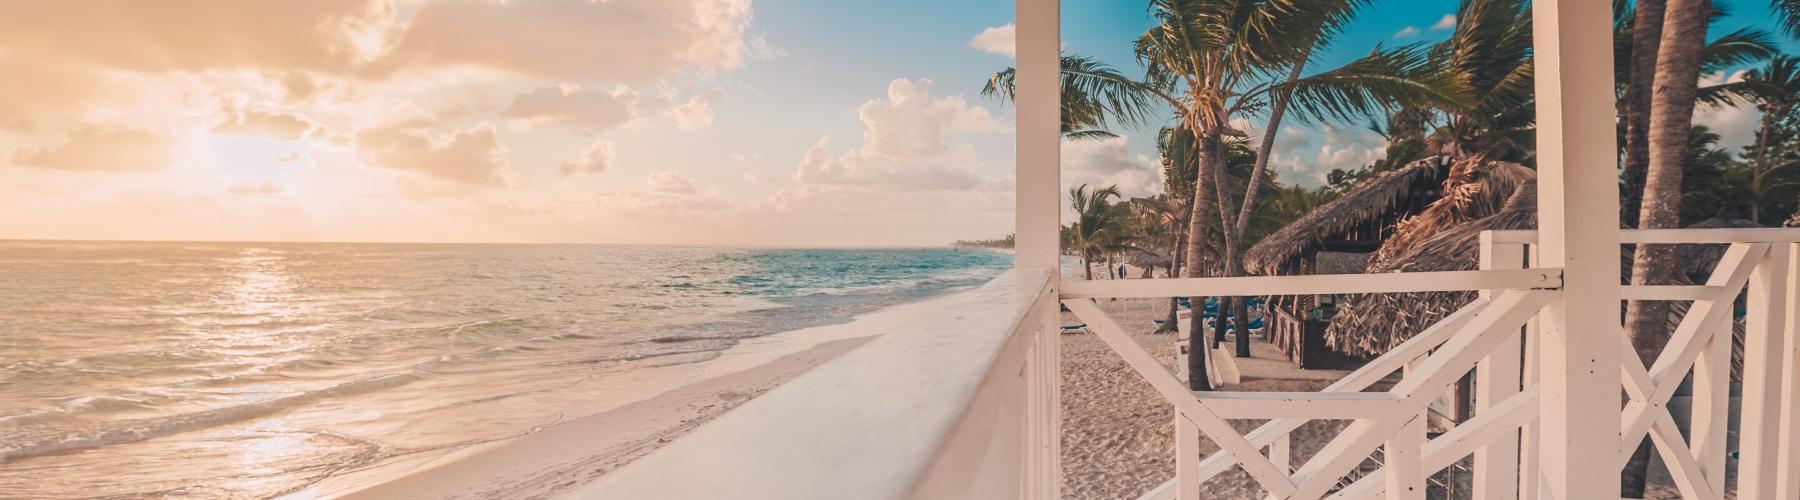 photo of beachfront property